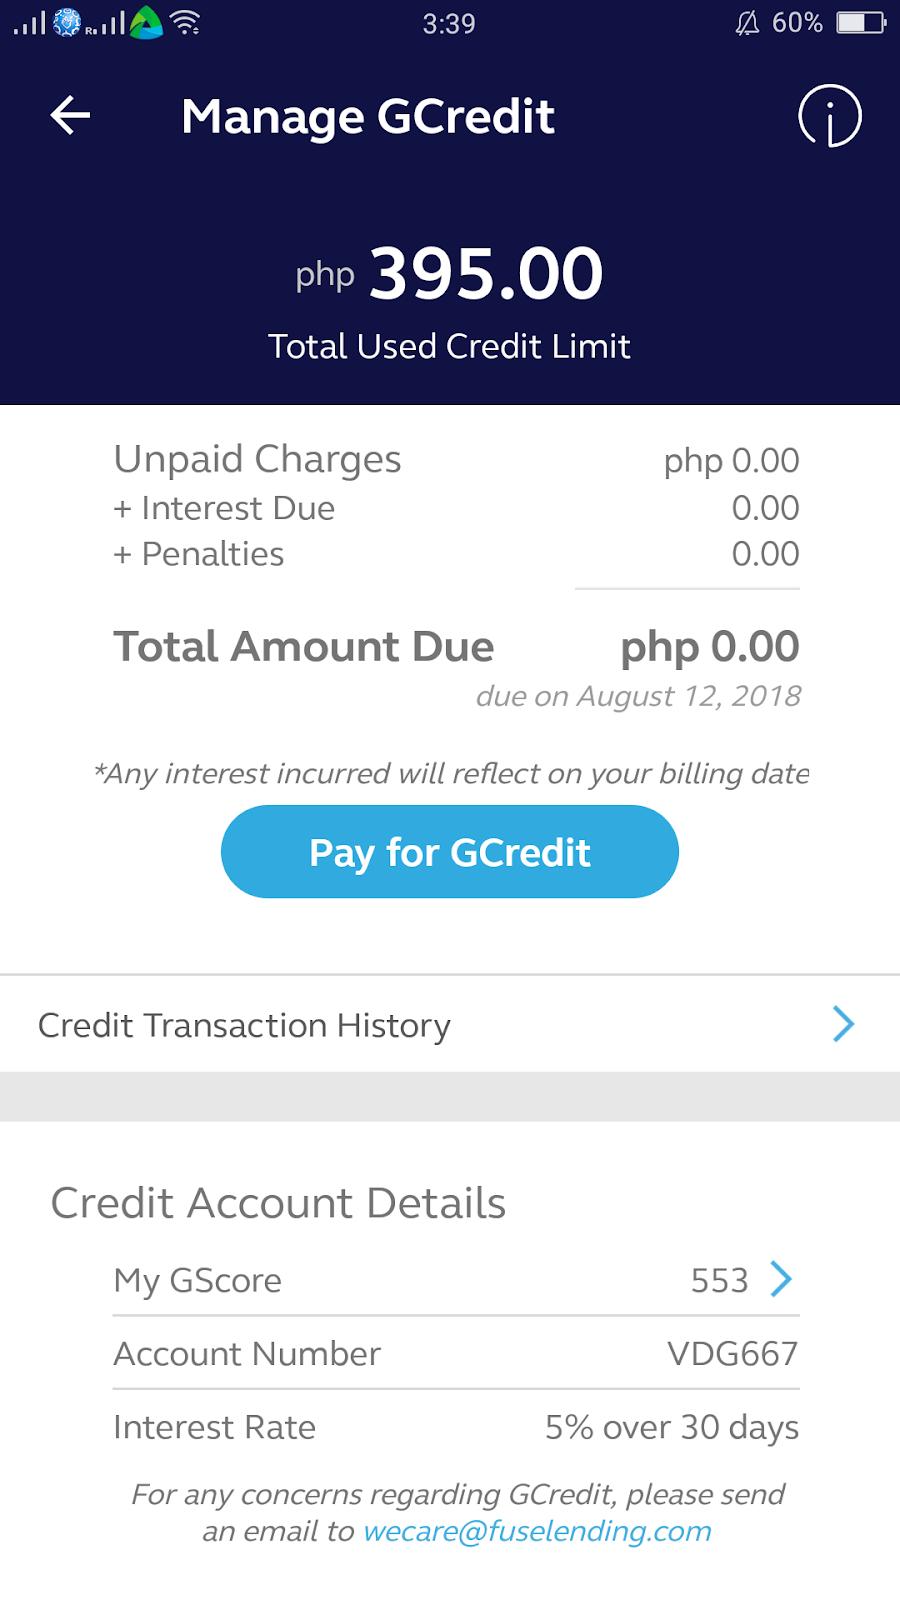 GCash' GCredit Is Pro Financial Inclusion ~ Viva Manilena